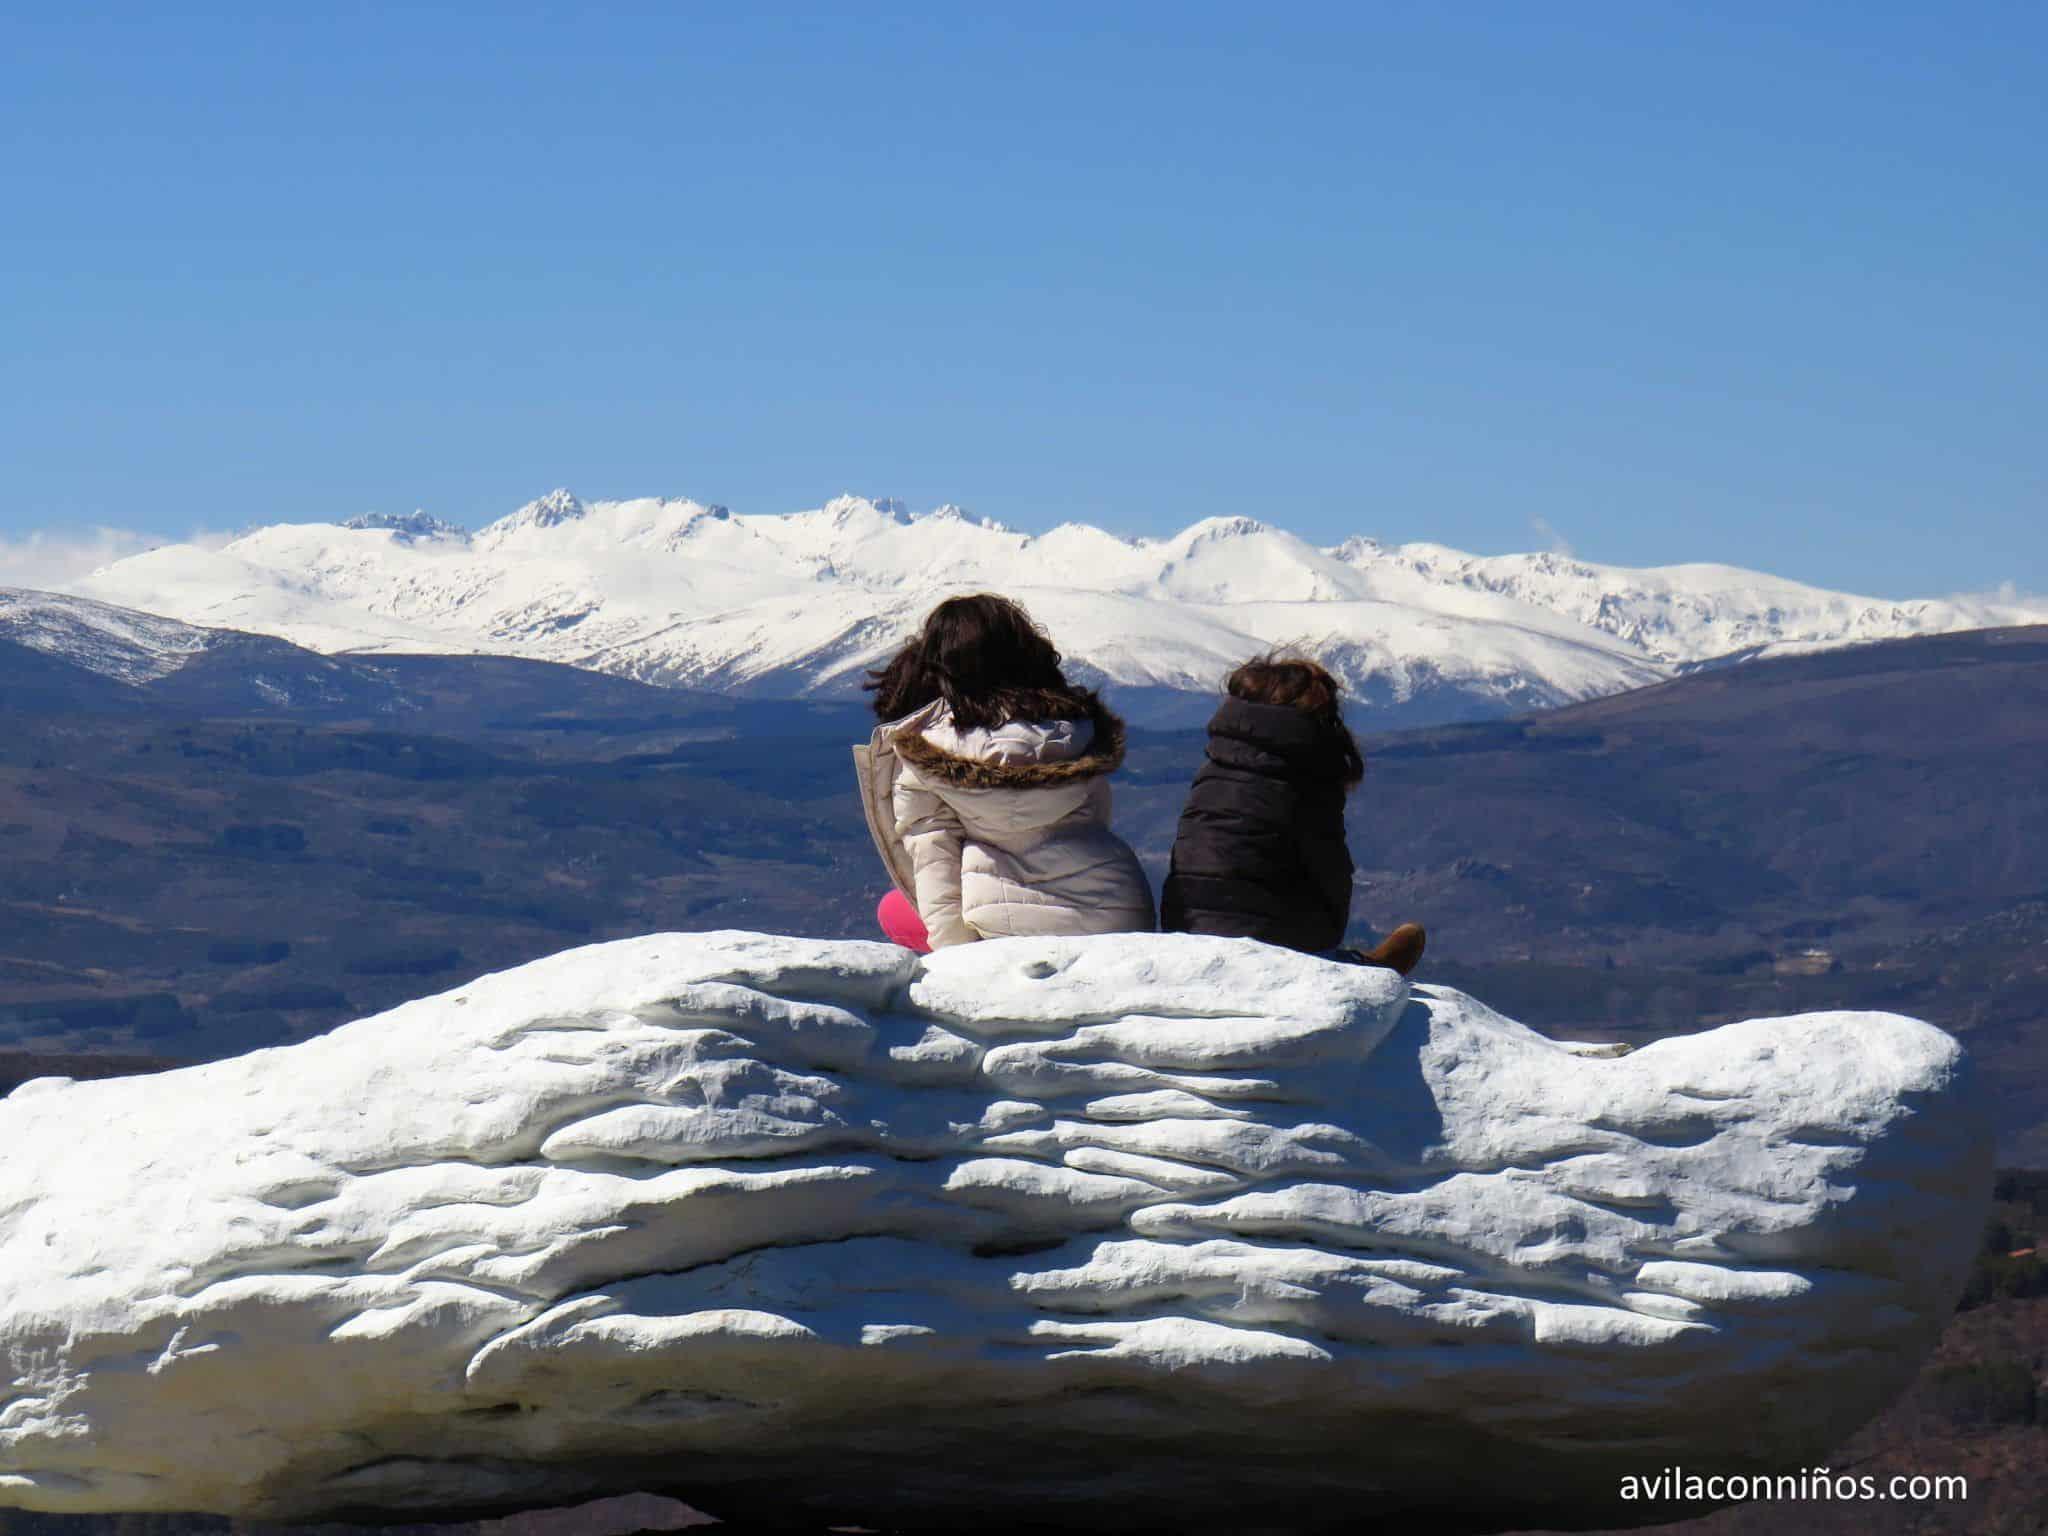 Cerro Gallinero